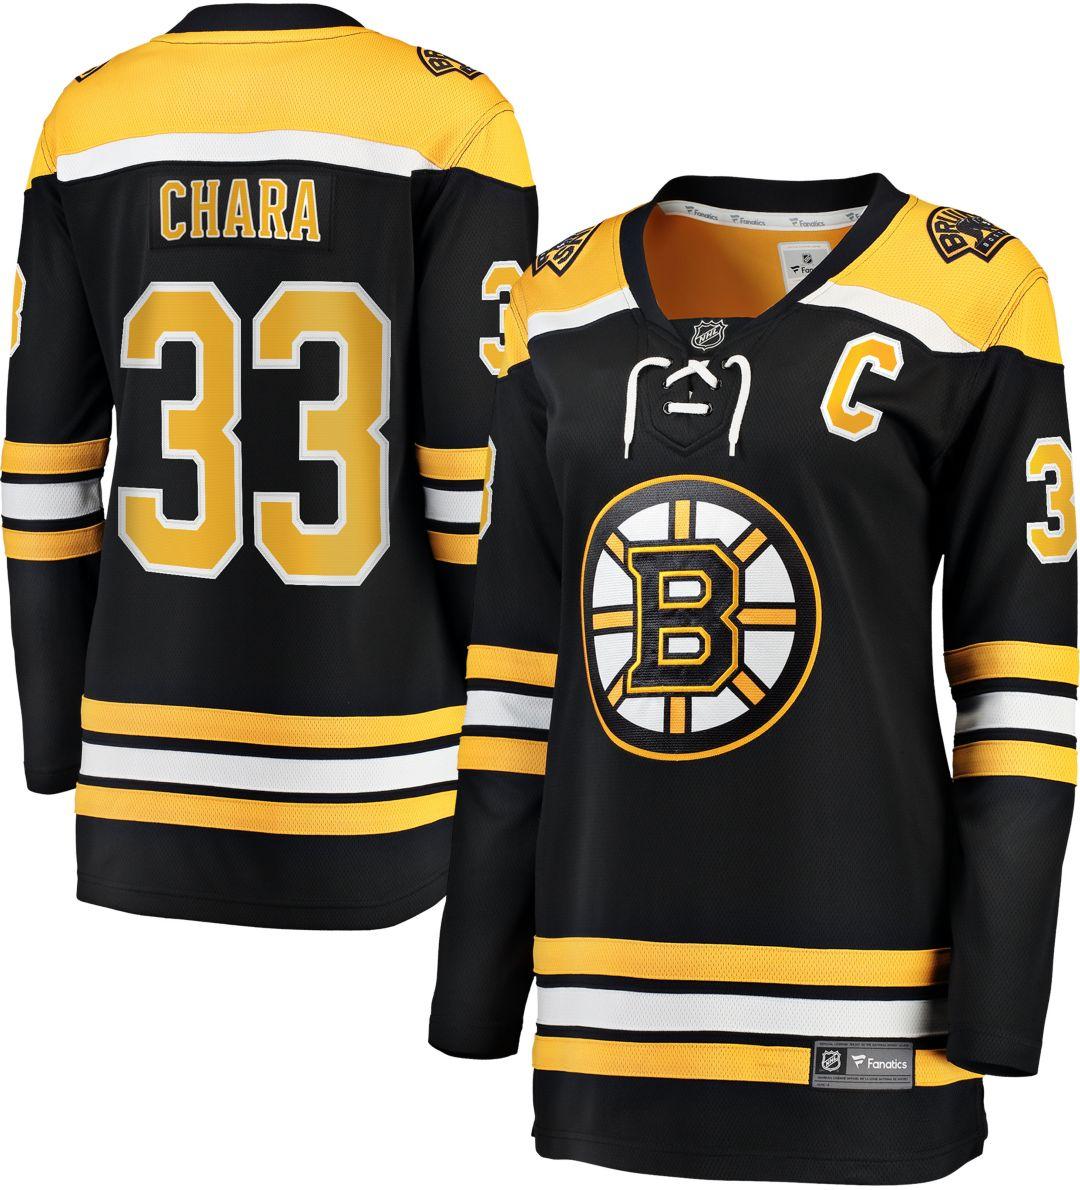 info for 86717 728ed NHL Women's Boston Bruins Zdeno Chara #33 Breakaway Home Replica Jersey